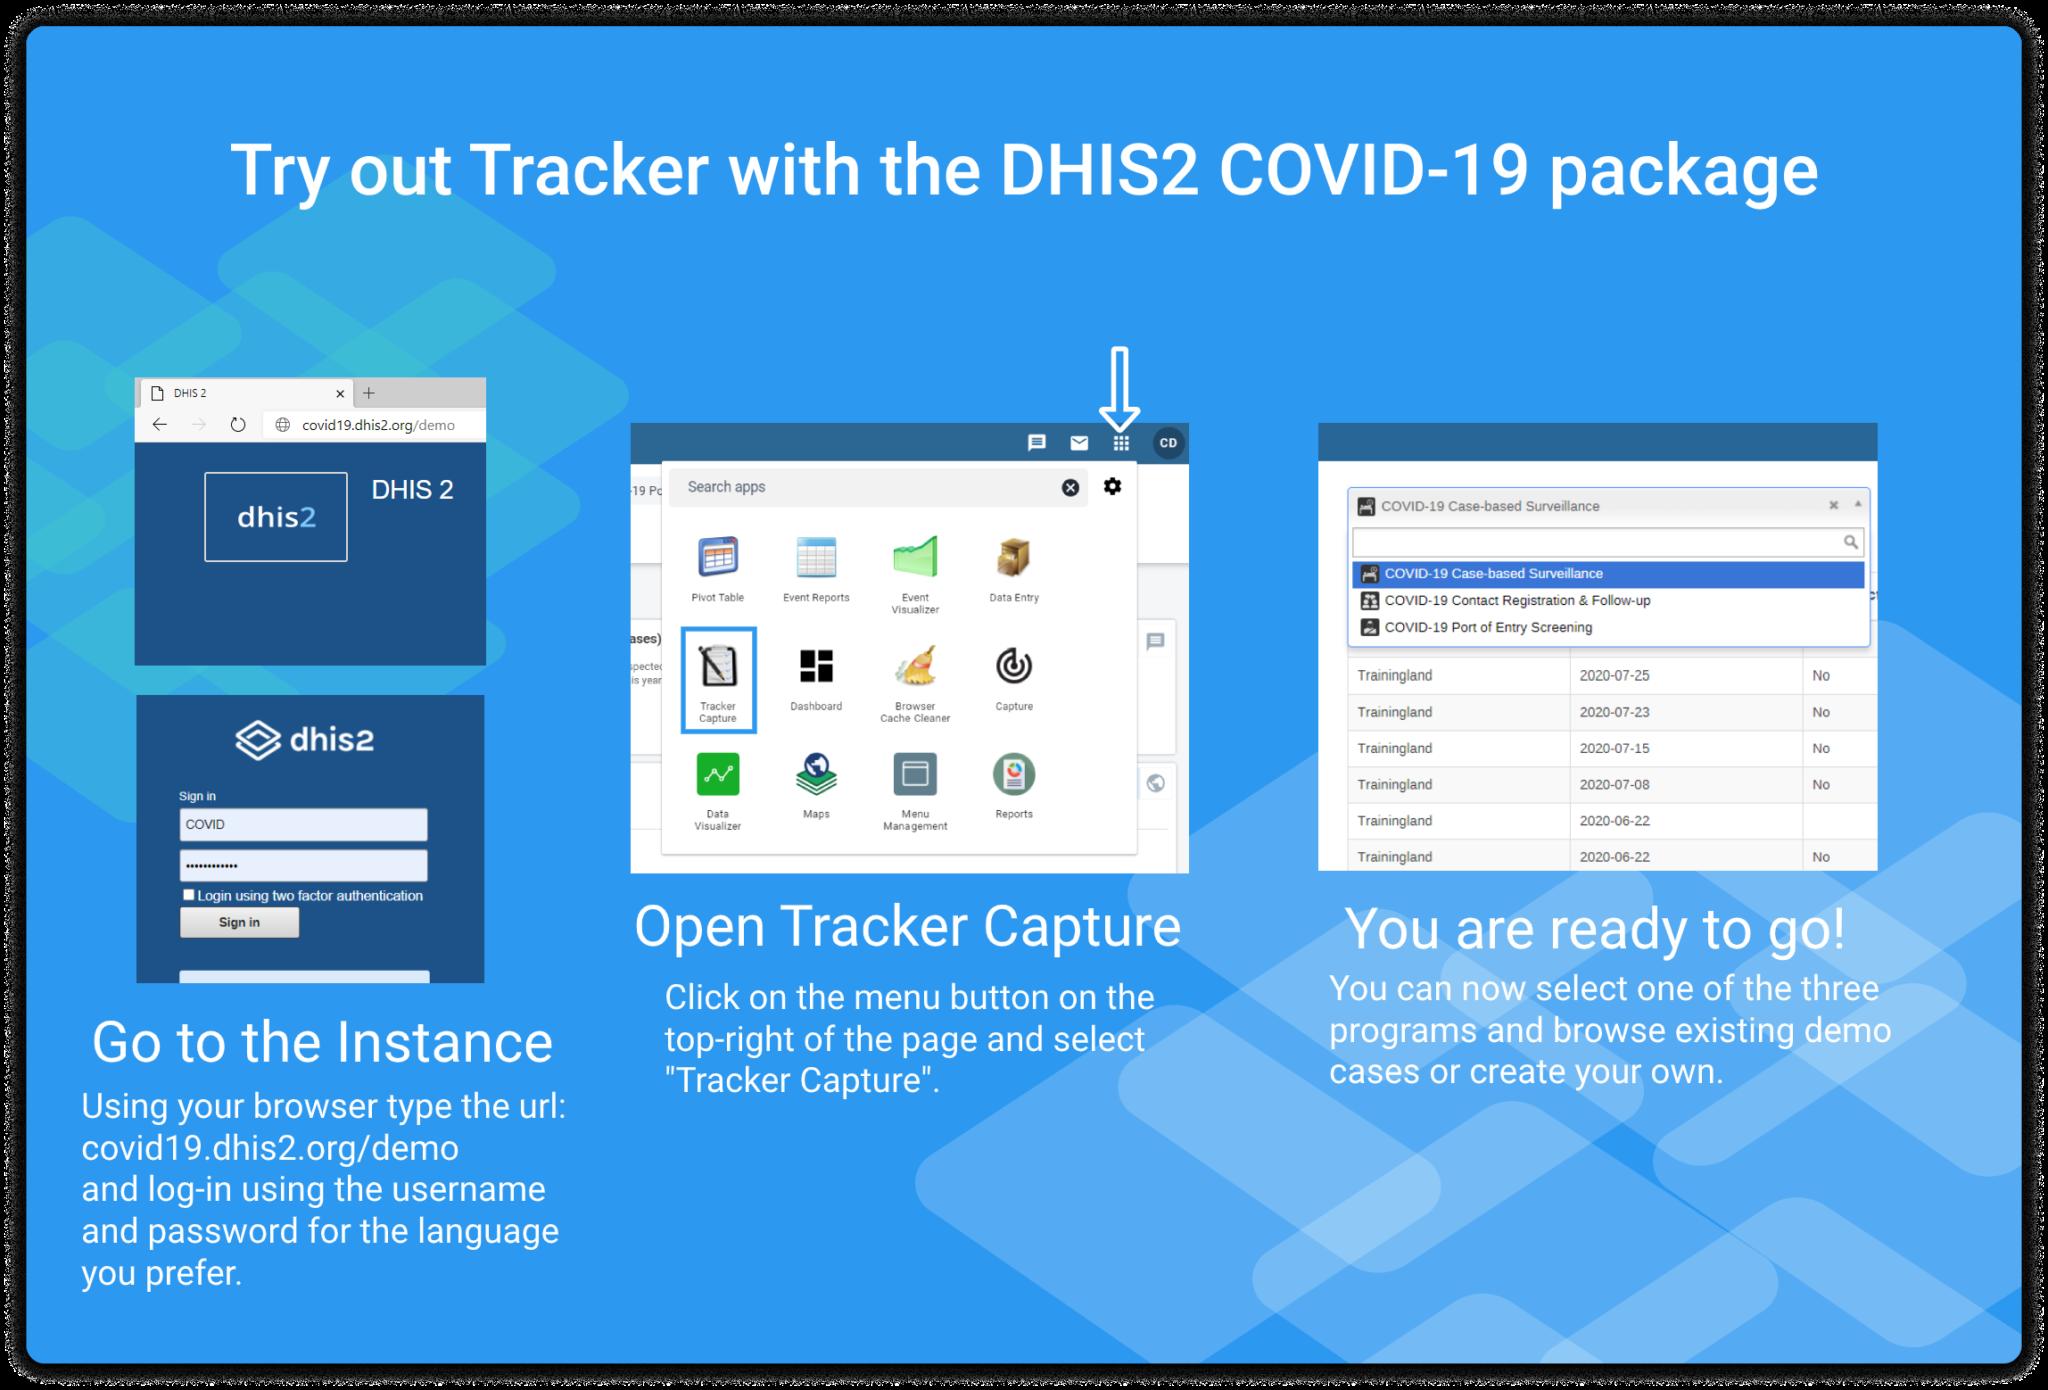 Tracker Demo Covid Instructions